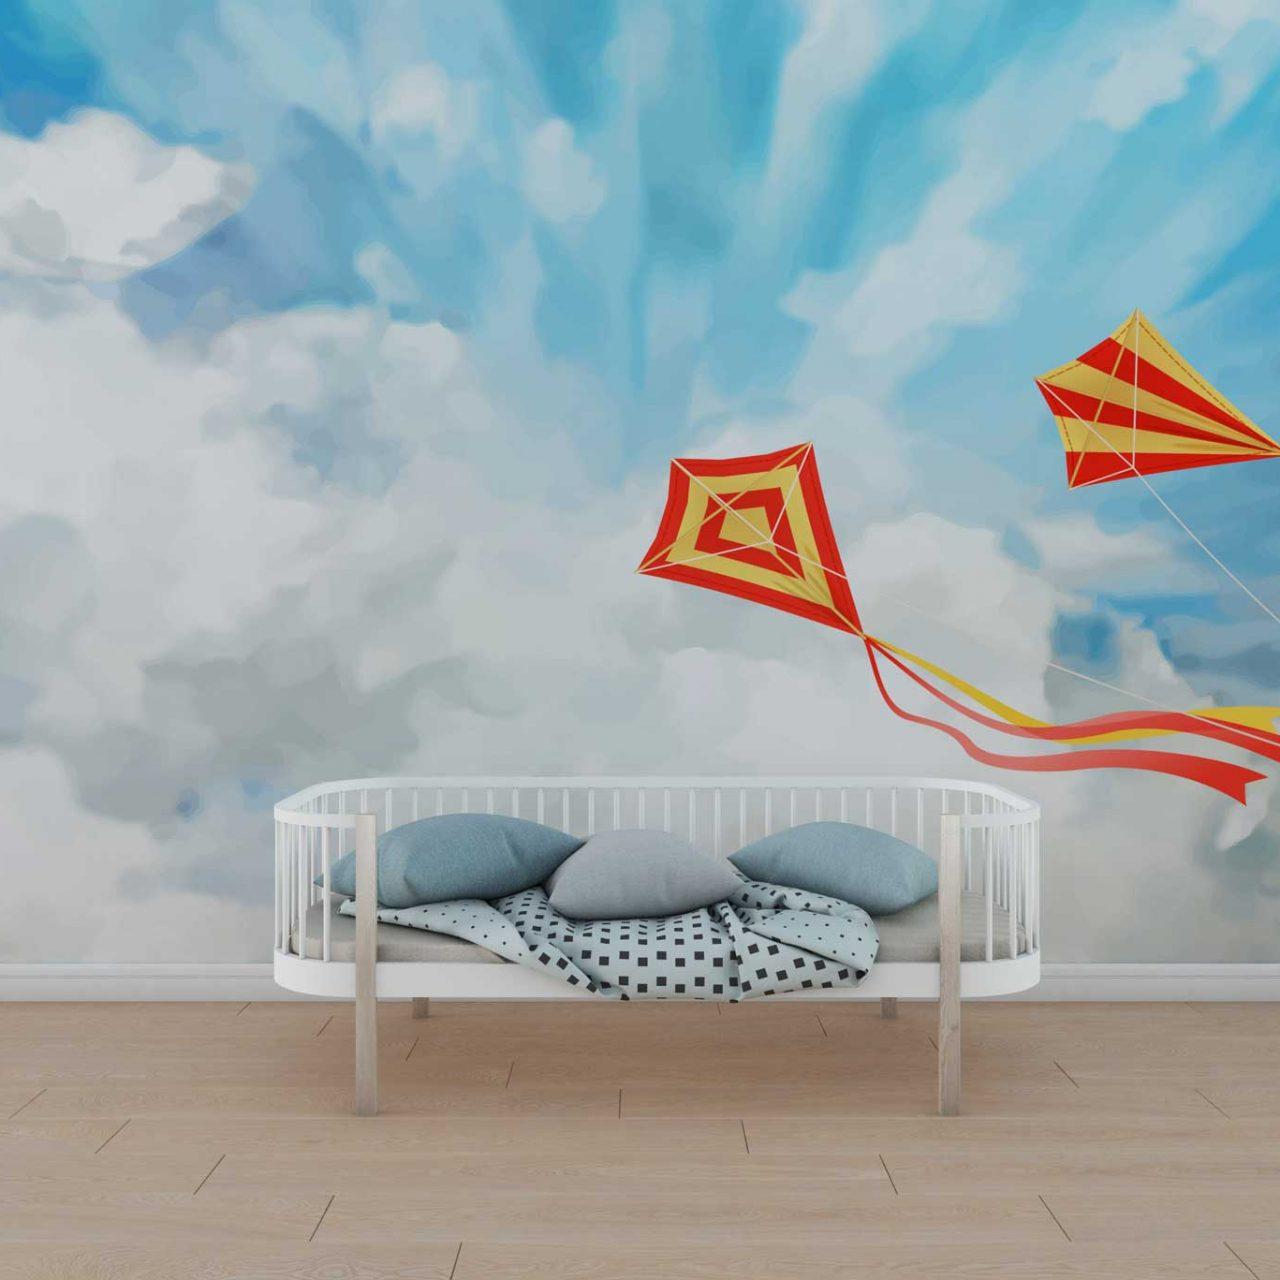 http://daringprints.ro/wp-content/uploads/2020/12/tapet-fototapet-design-personalizat-customizabil-comanda-special-camera-dormitor-copii-model-cer-senin-zmeie-rosu-galben-nori-albi-desen-pictura-1280x1280.jpg